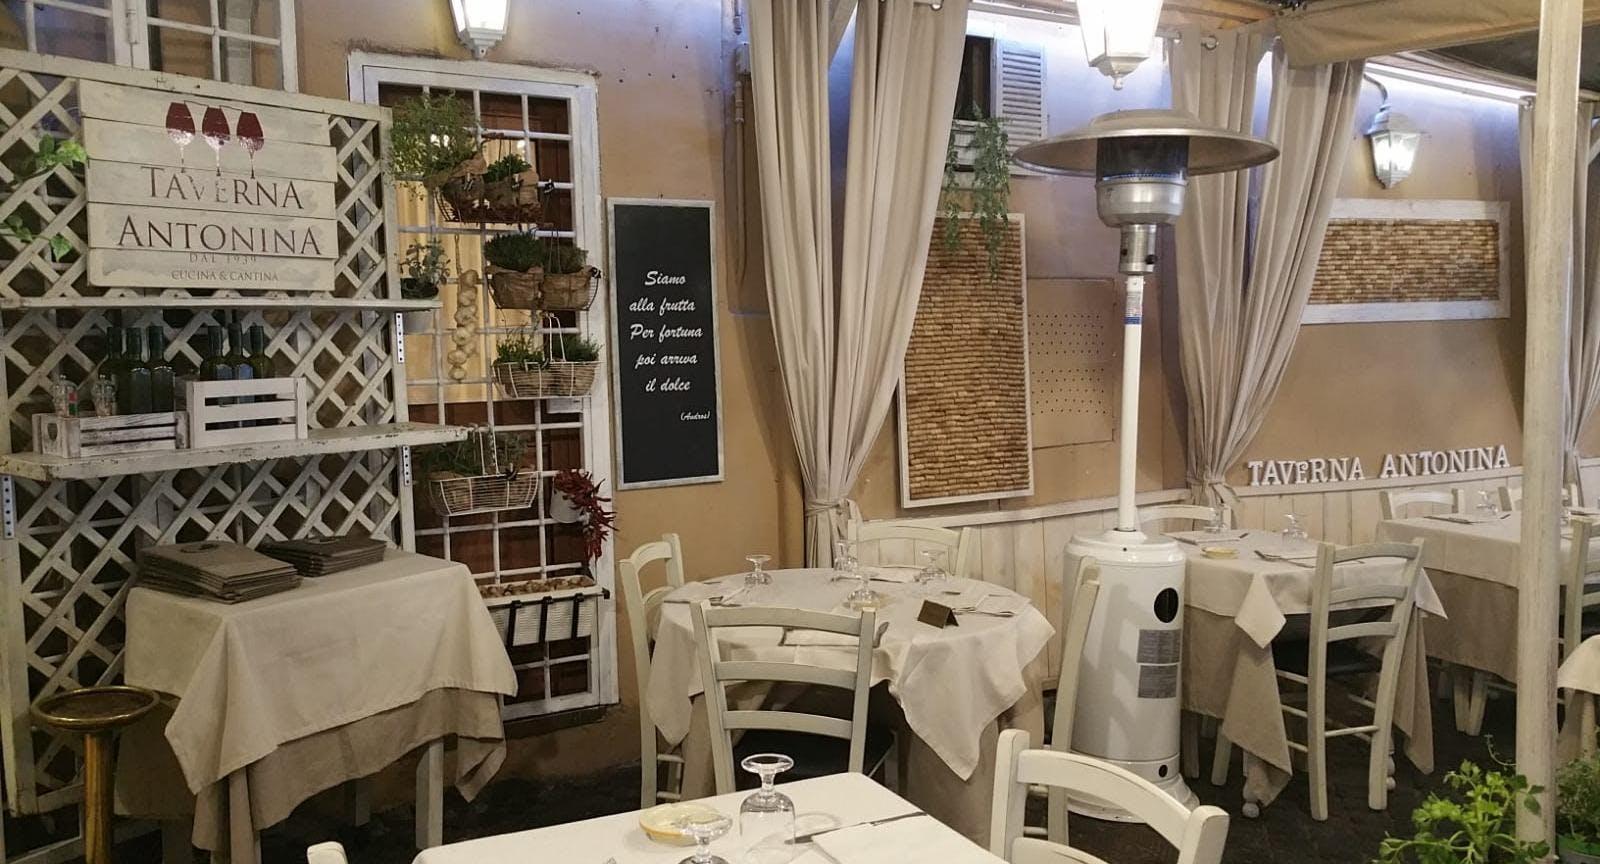 Taverna Antonina dal 1939 Rom image 2